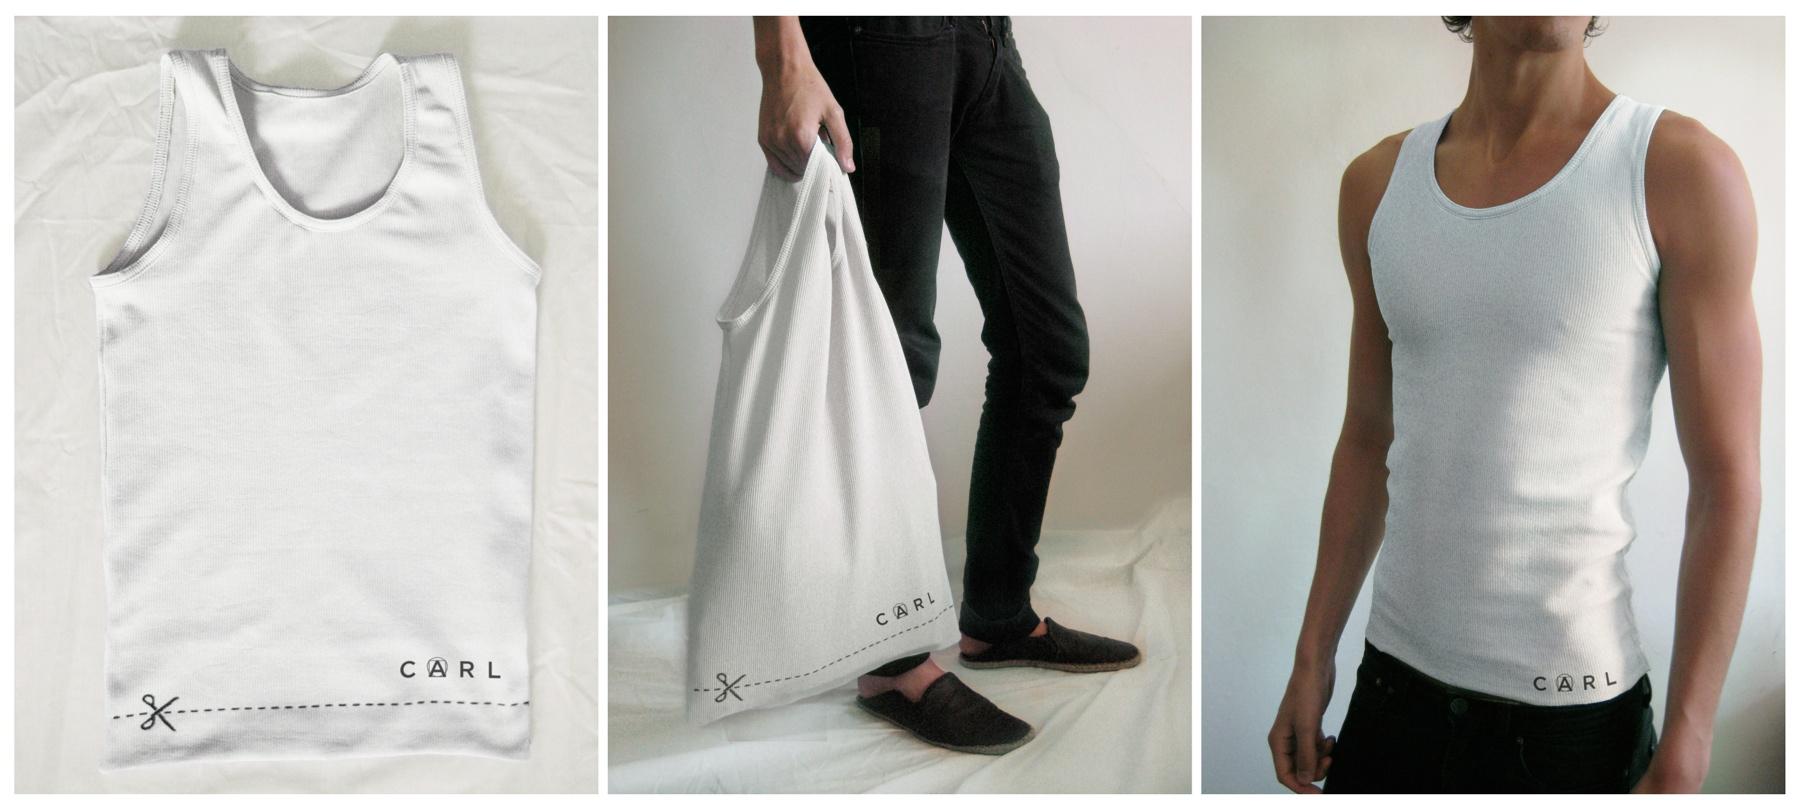 Carl-Summer-Bag